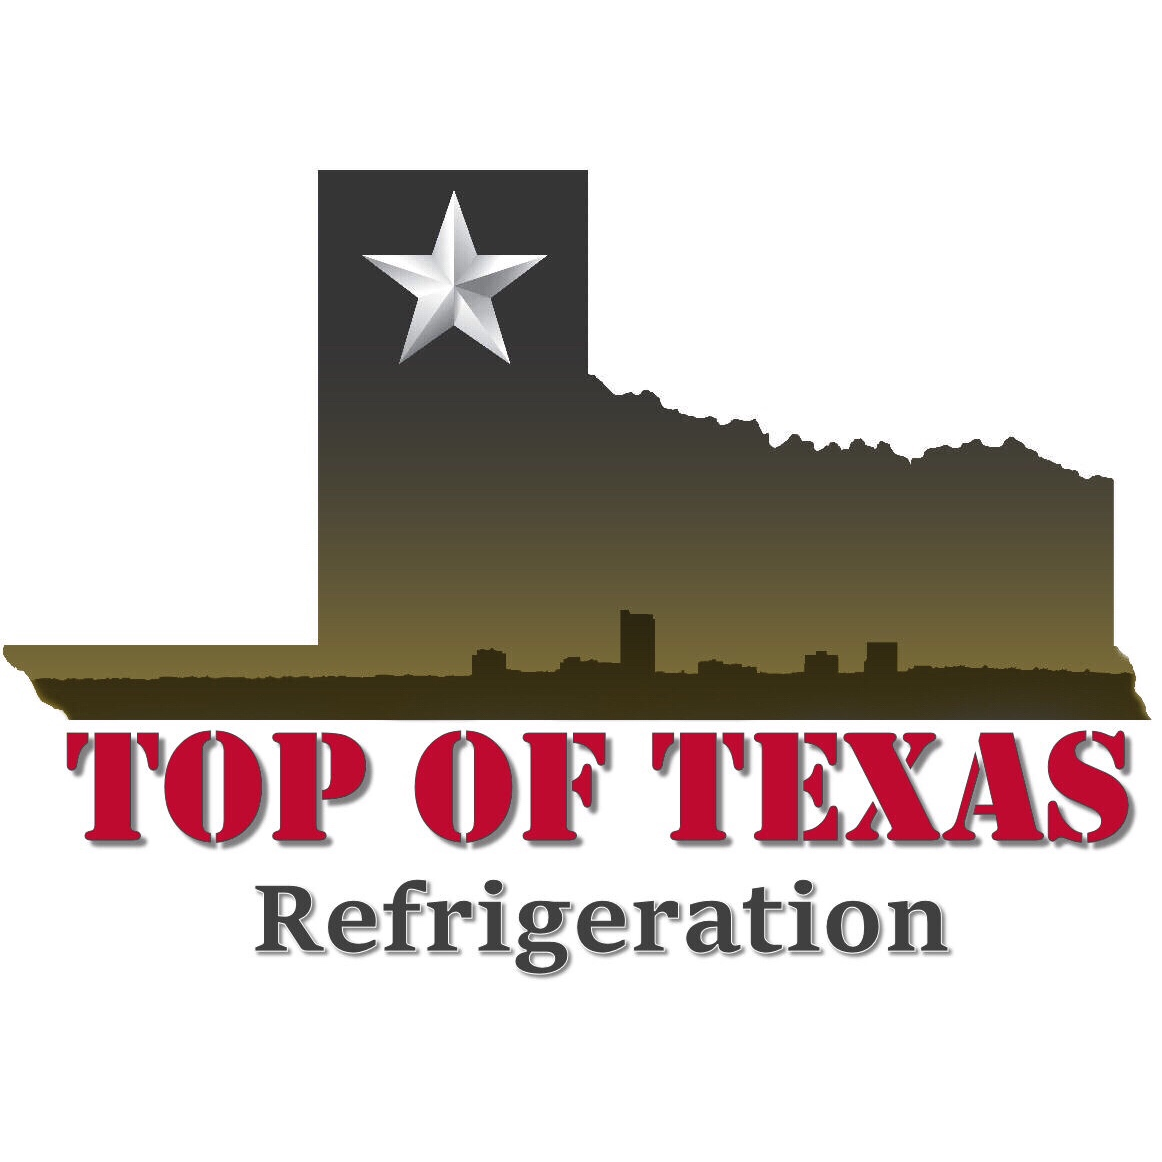 Top of Texas Refrigeration